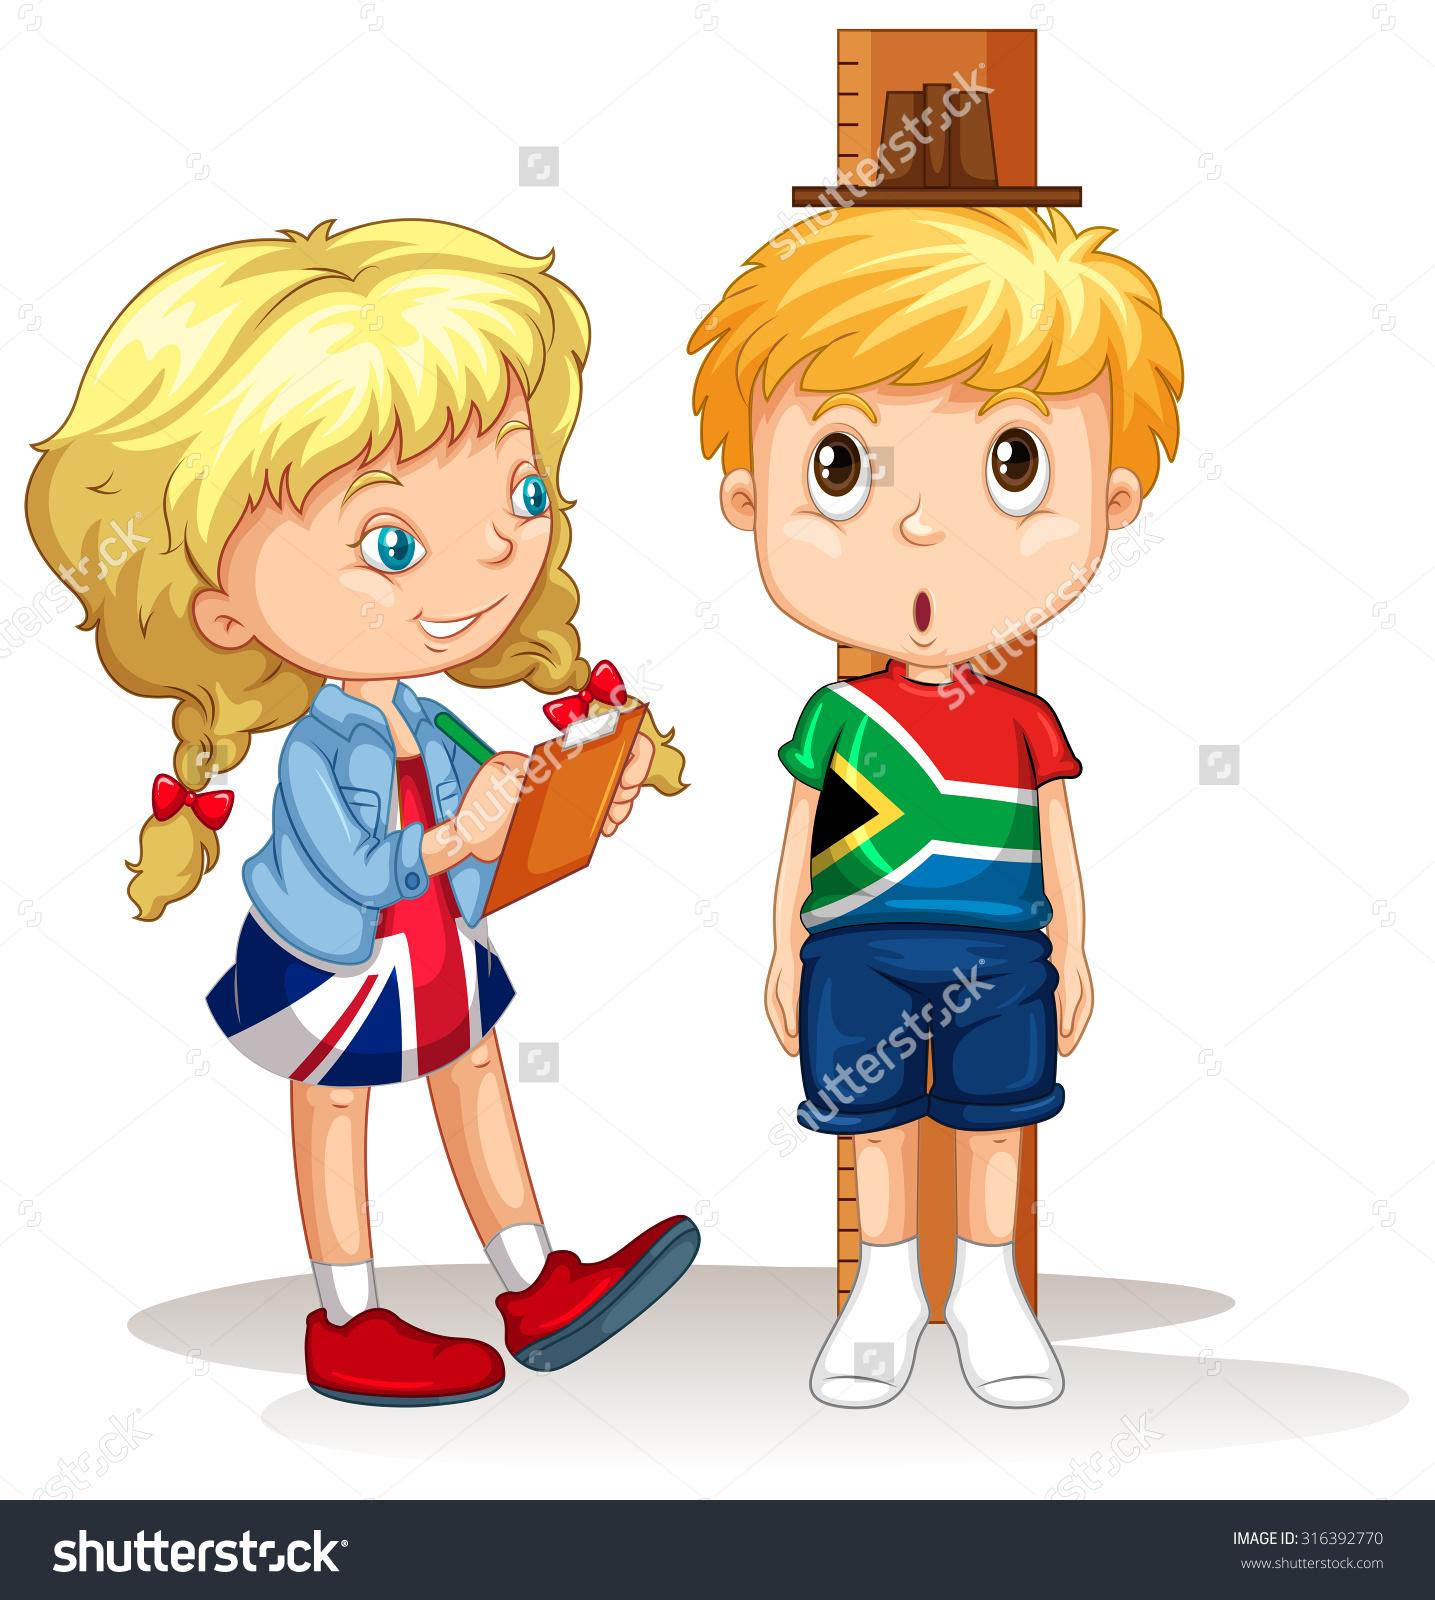 Boy Girl Measure Height Illustration Stock Vector 316392770.